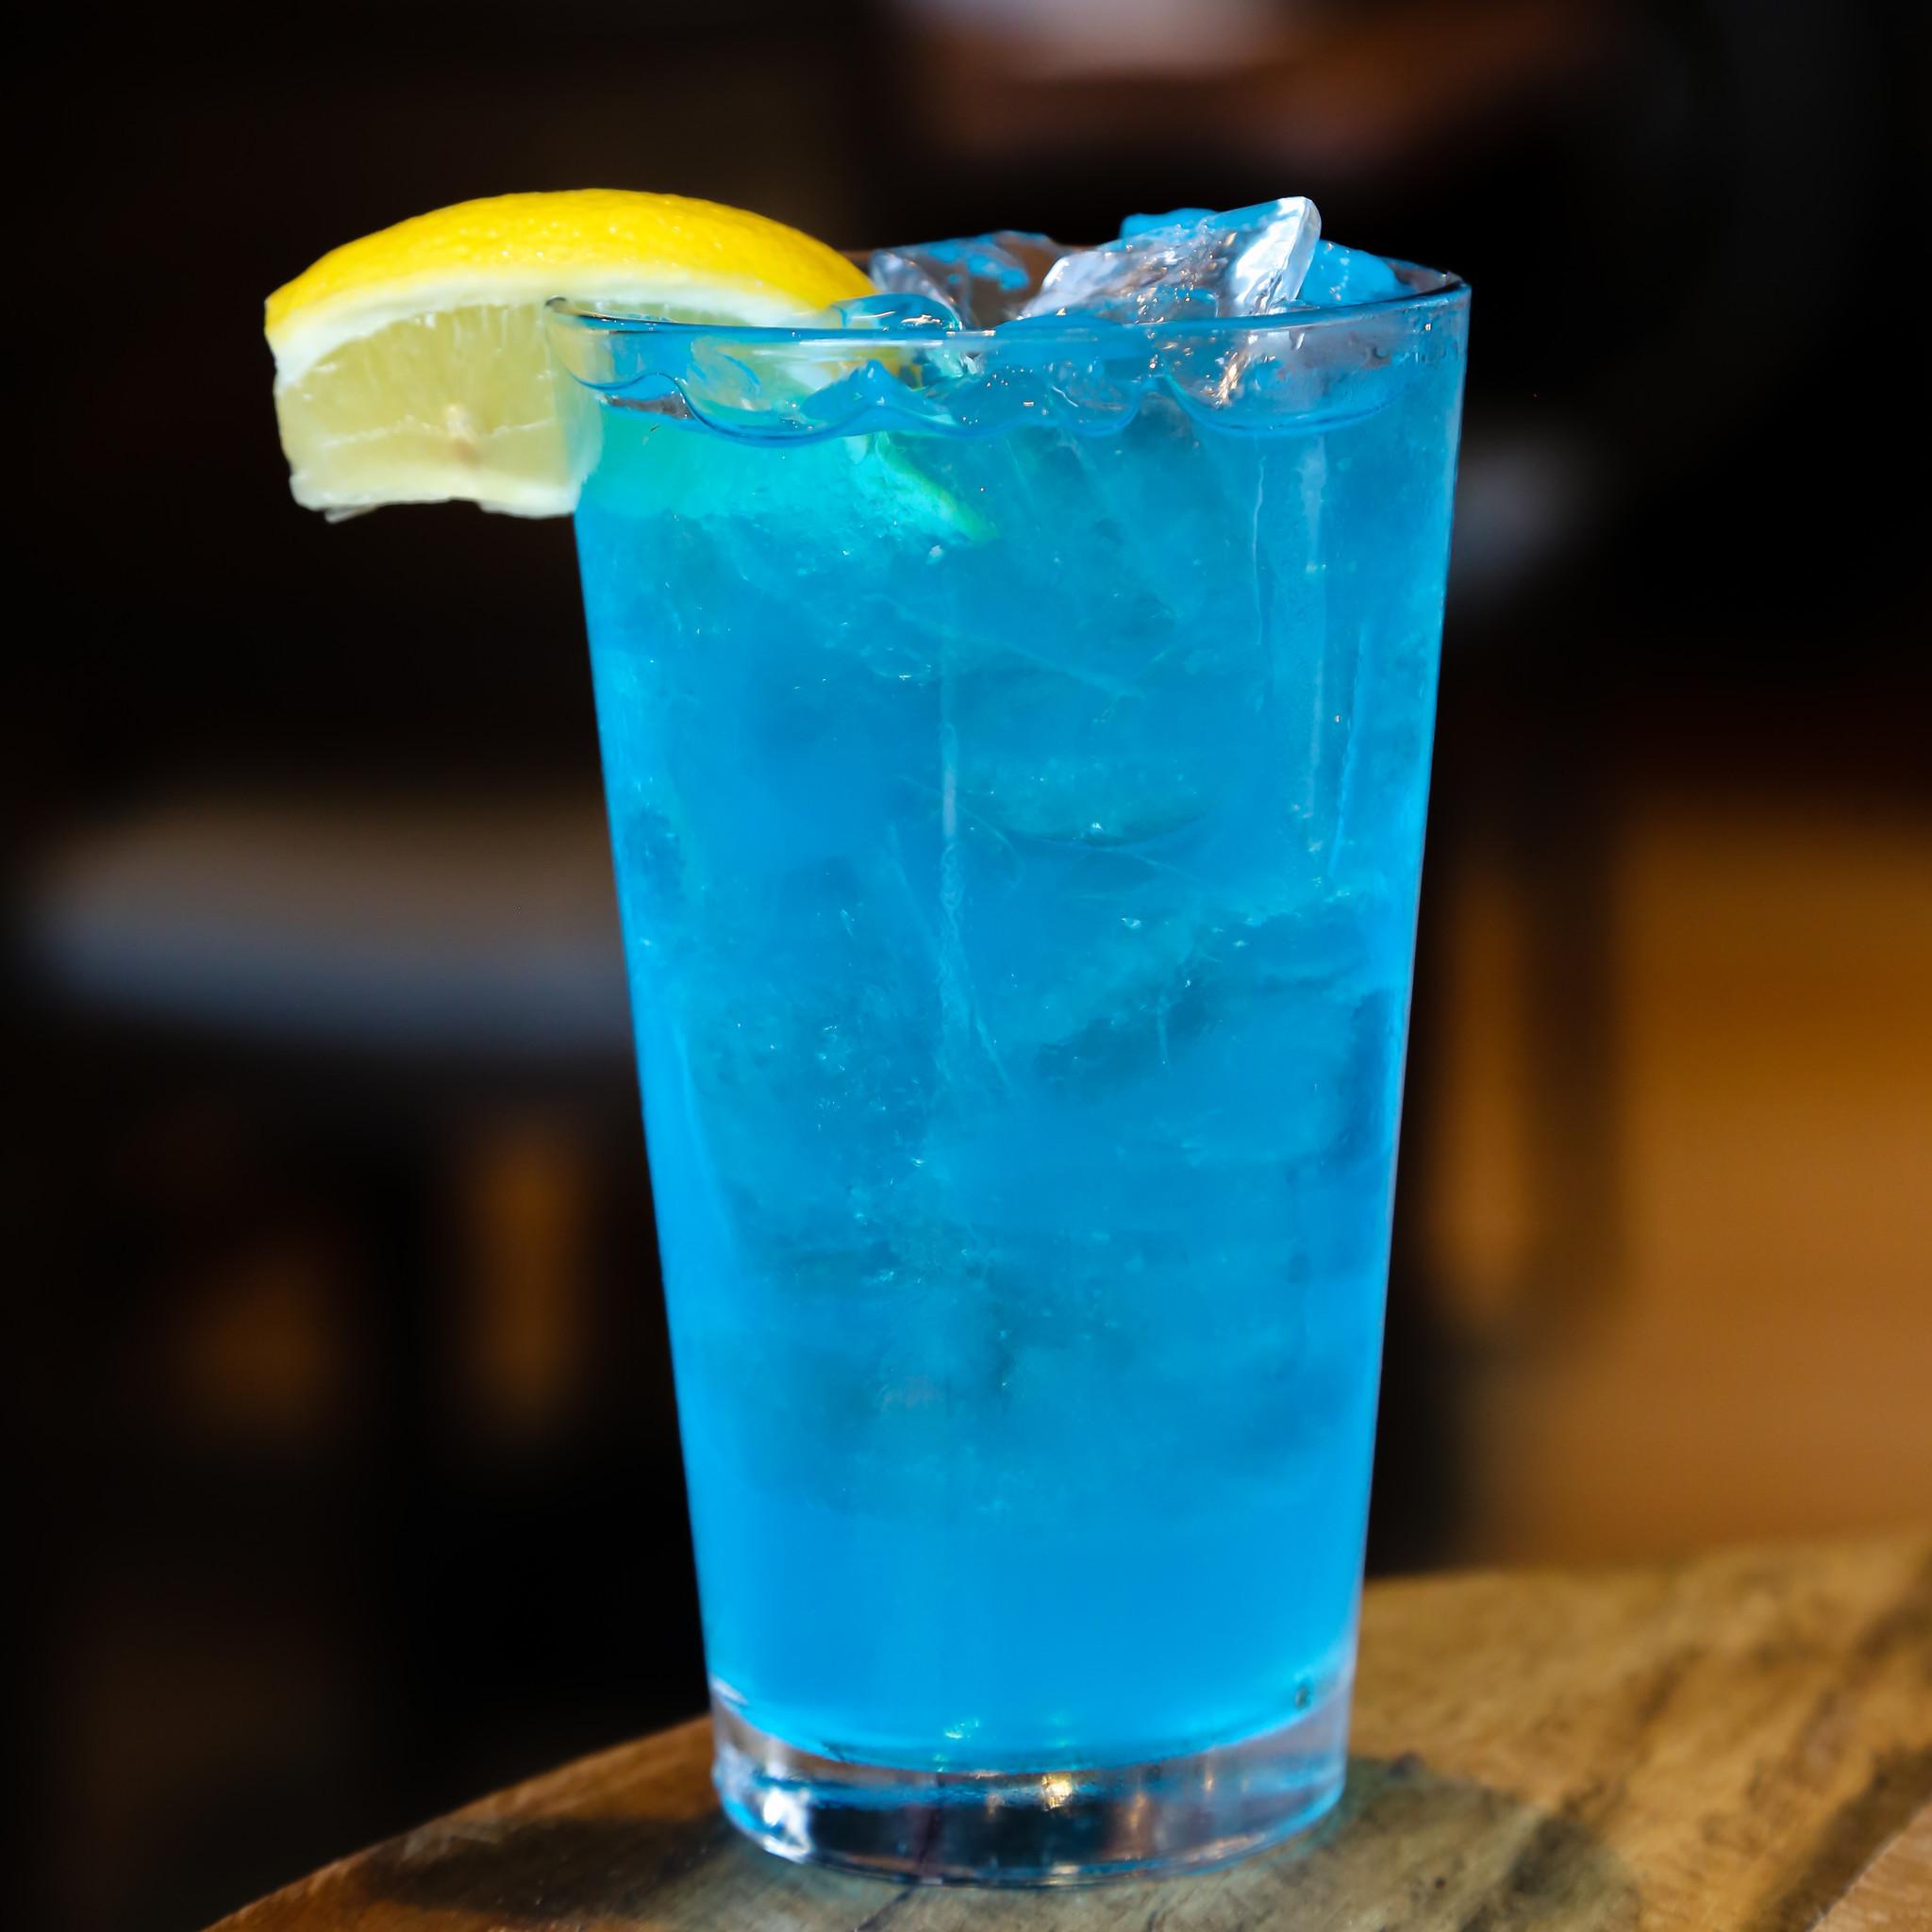 Electric Lemonade from Oggi's.